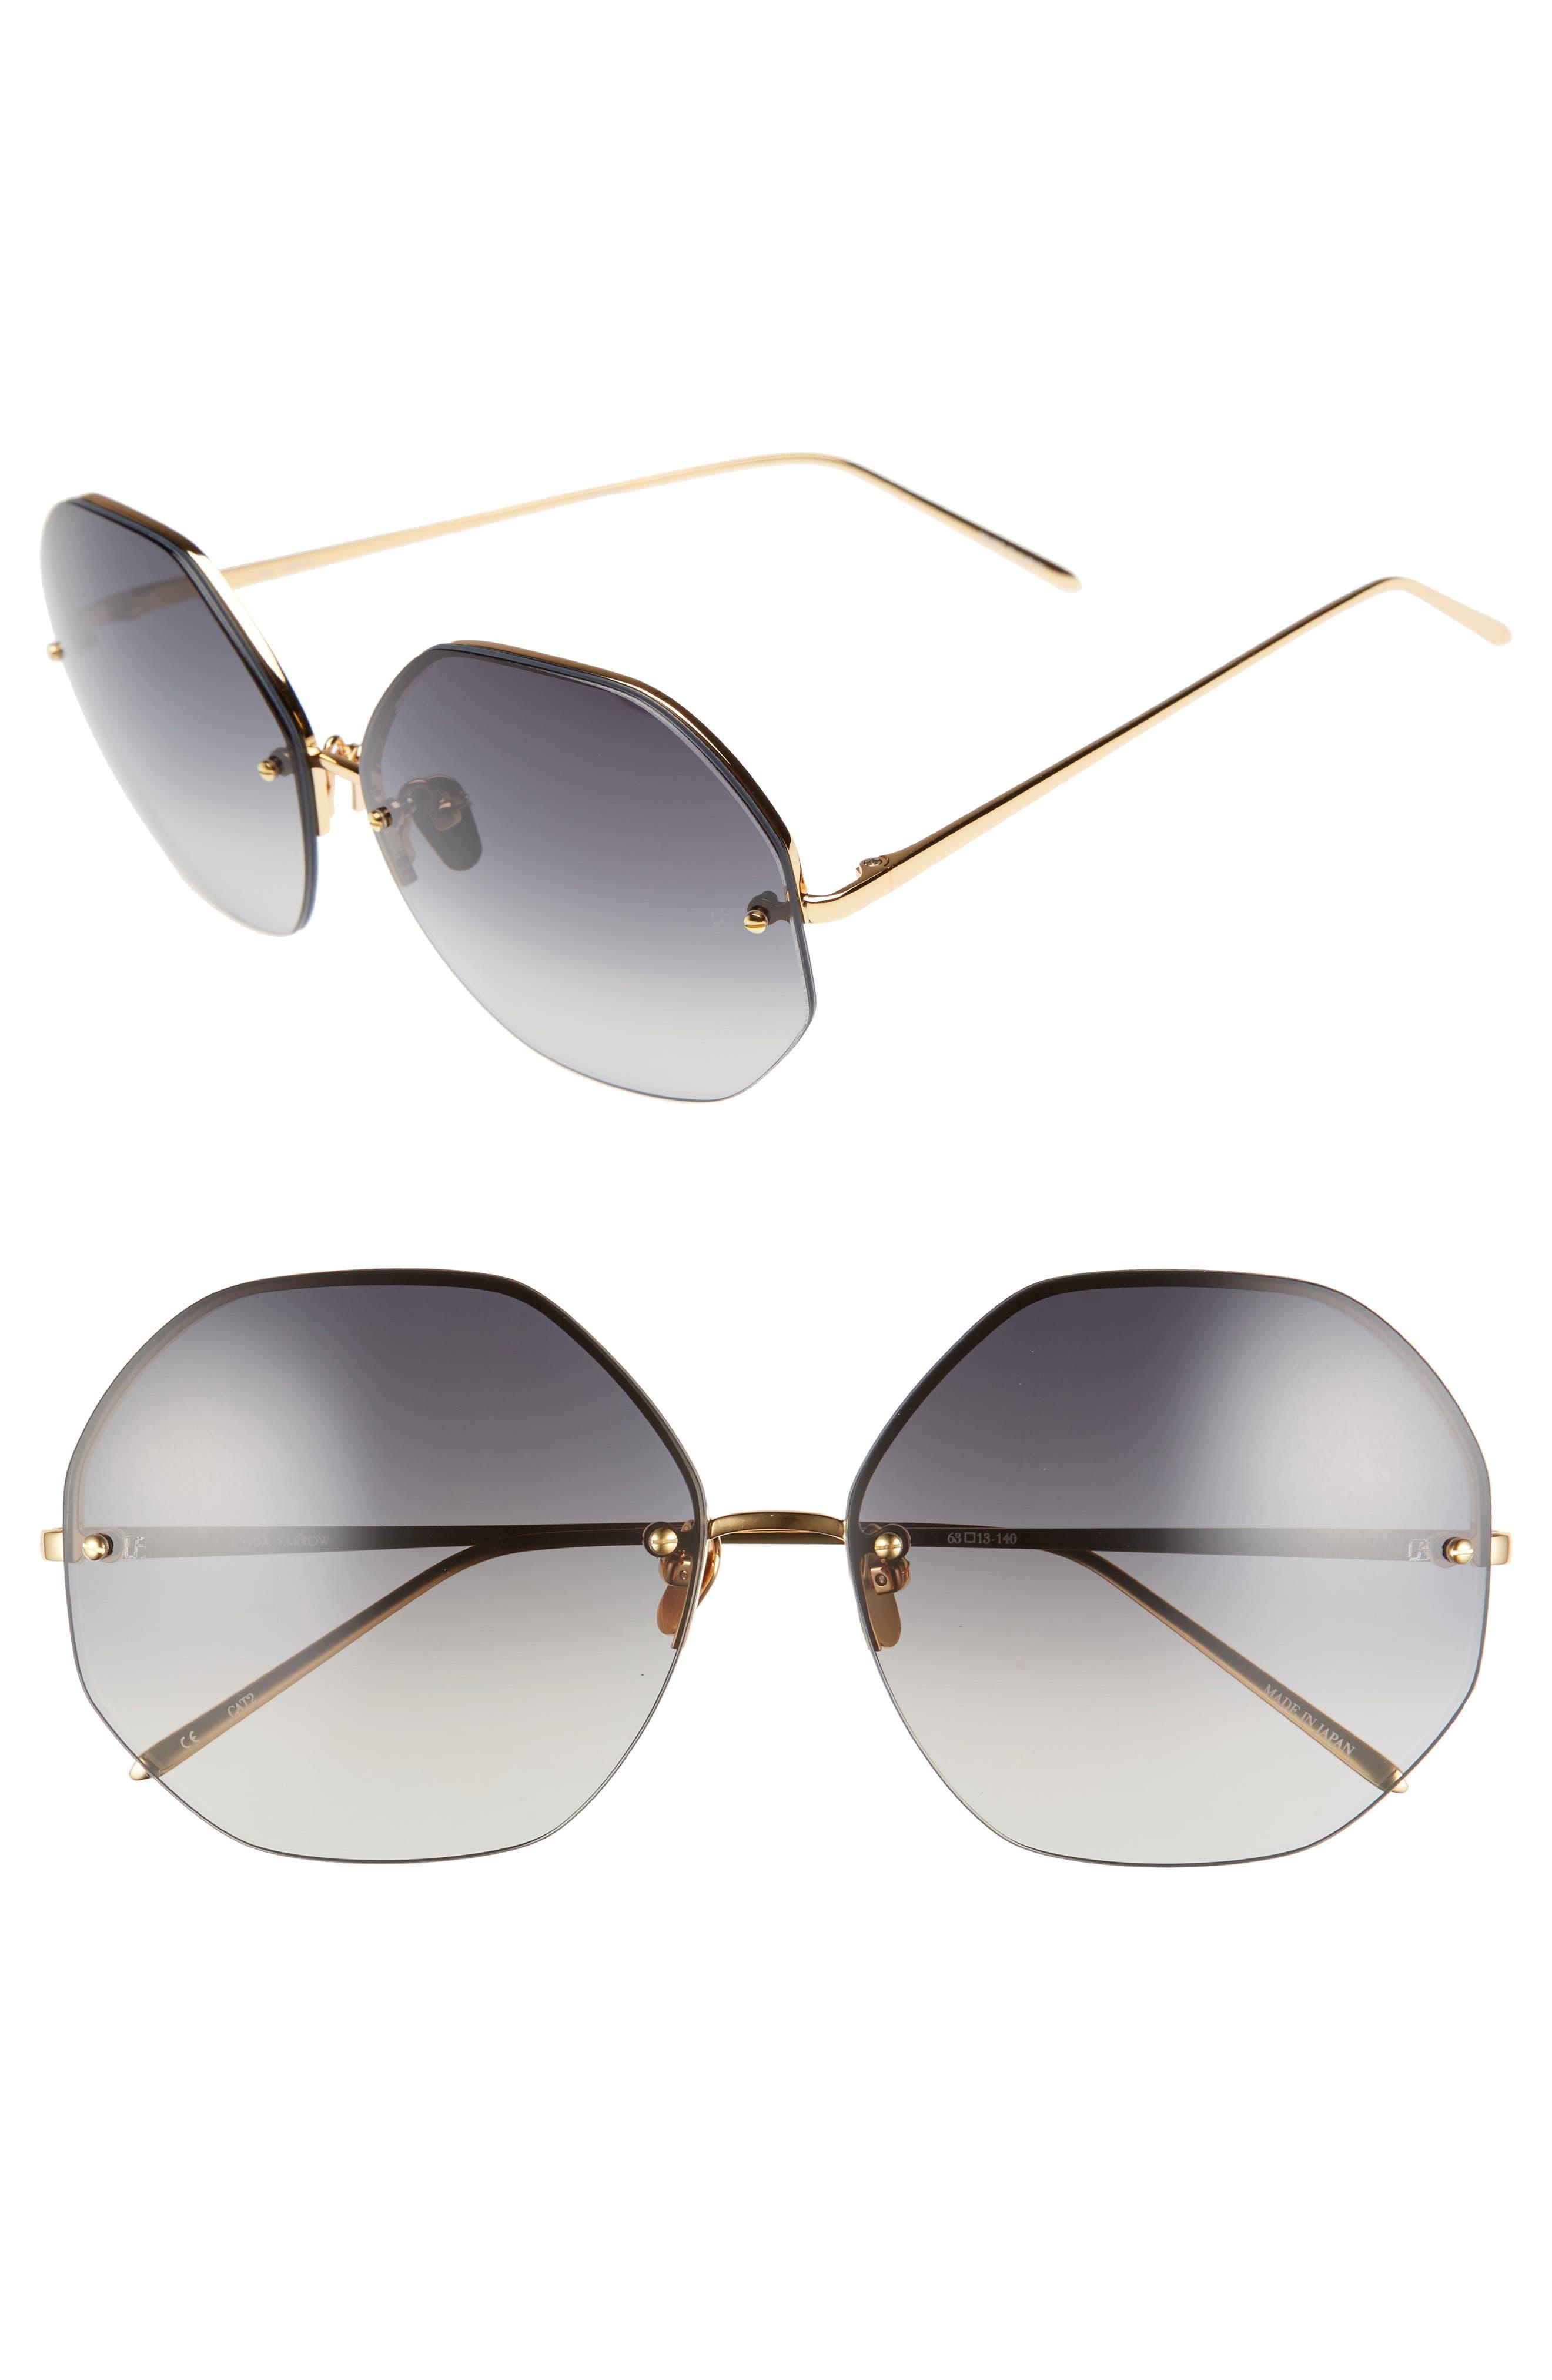 63mm Semi Rimless Round Titanium Sunglasses,                         Main,                         color, Yellow Gold/ Grey